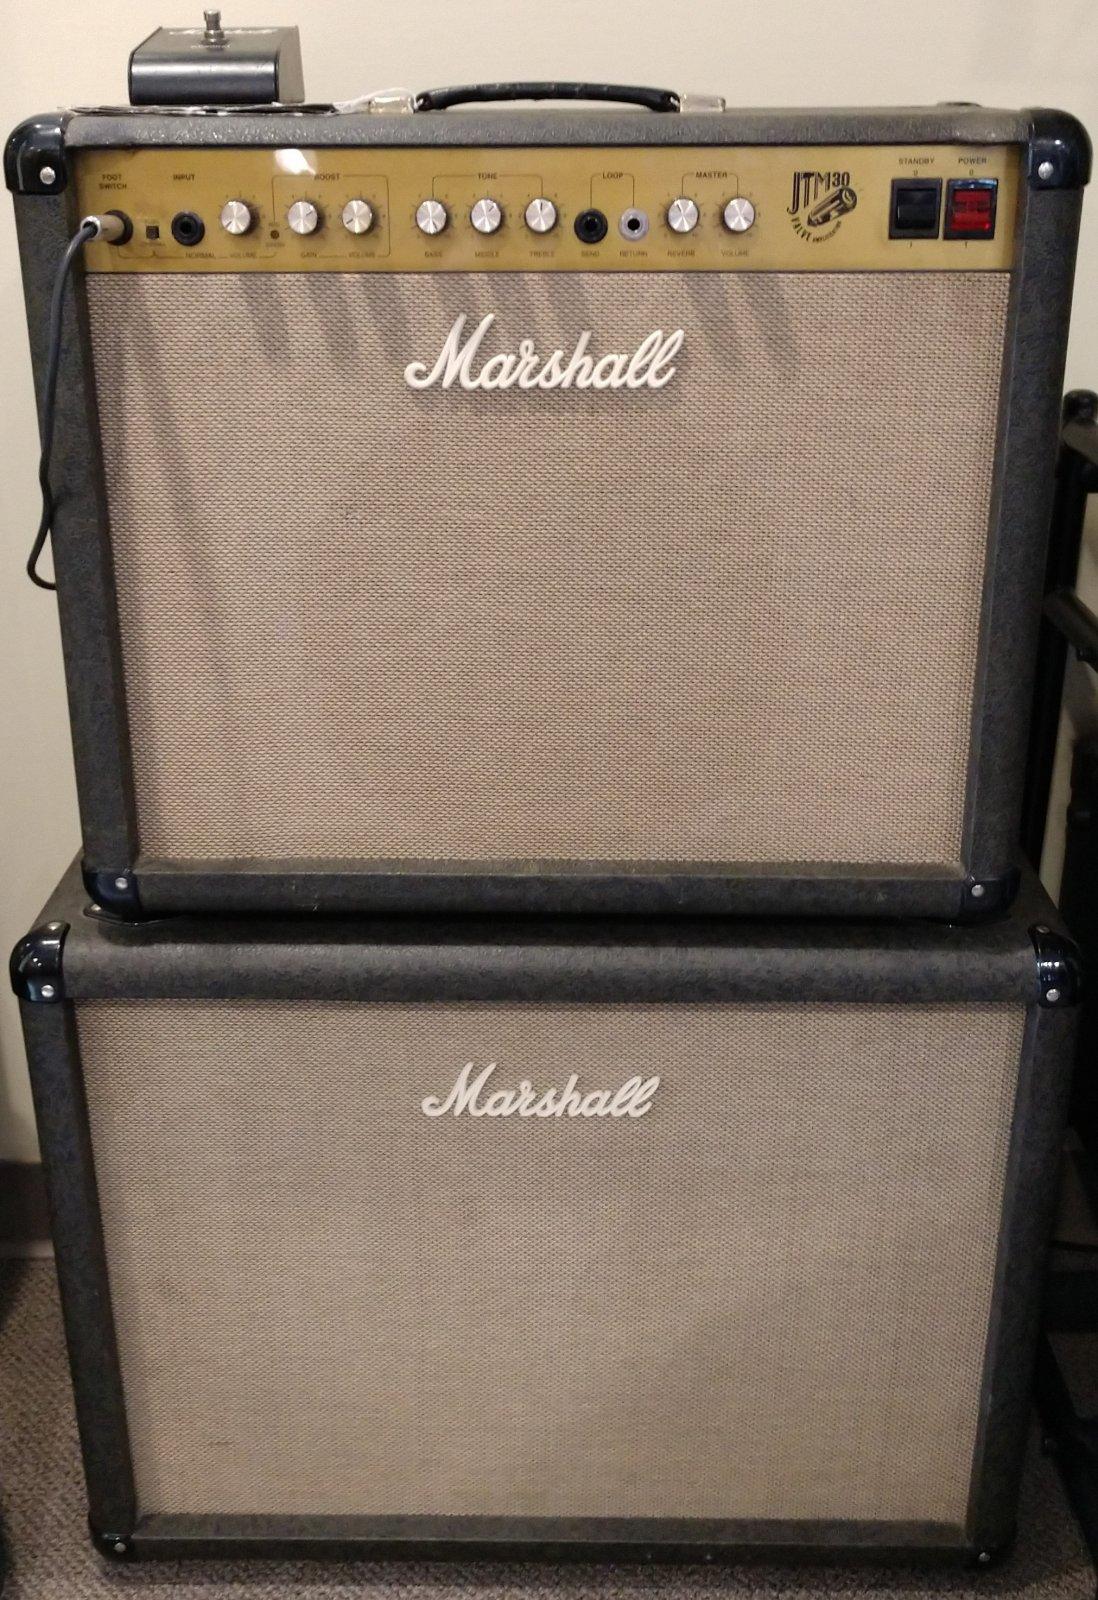 AMPLIFIER - 80s era Marshall JTM 30 w/ Matching 2x12 Cab & Covers - Tube